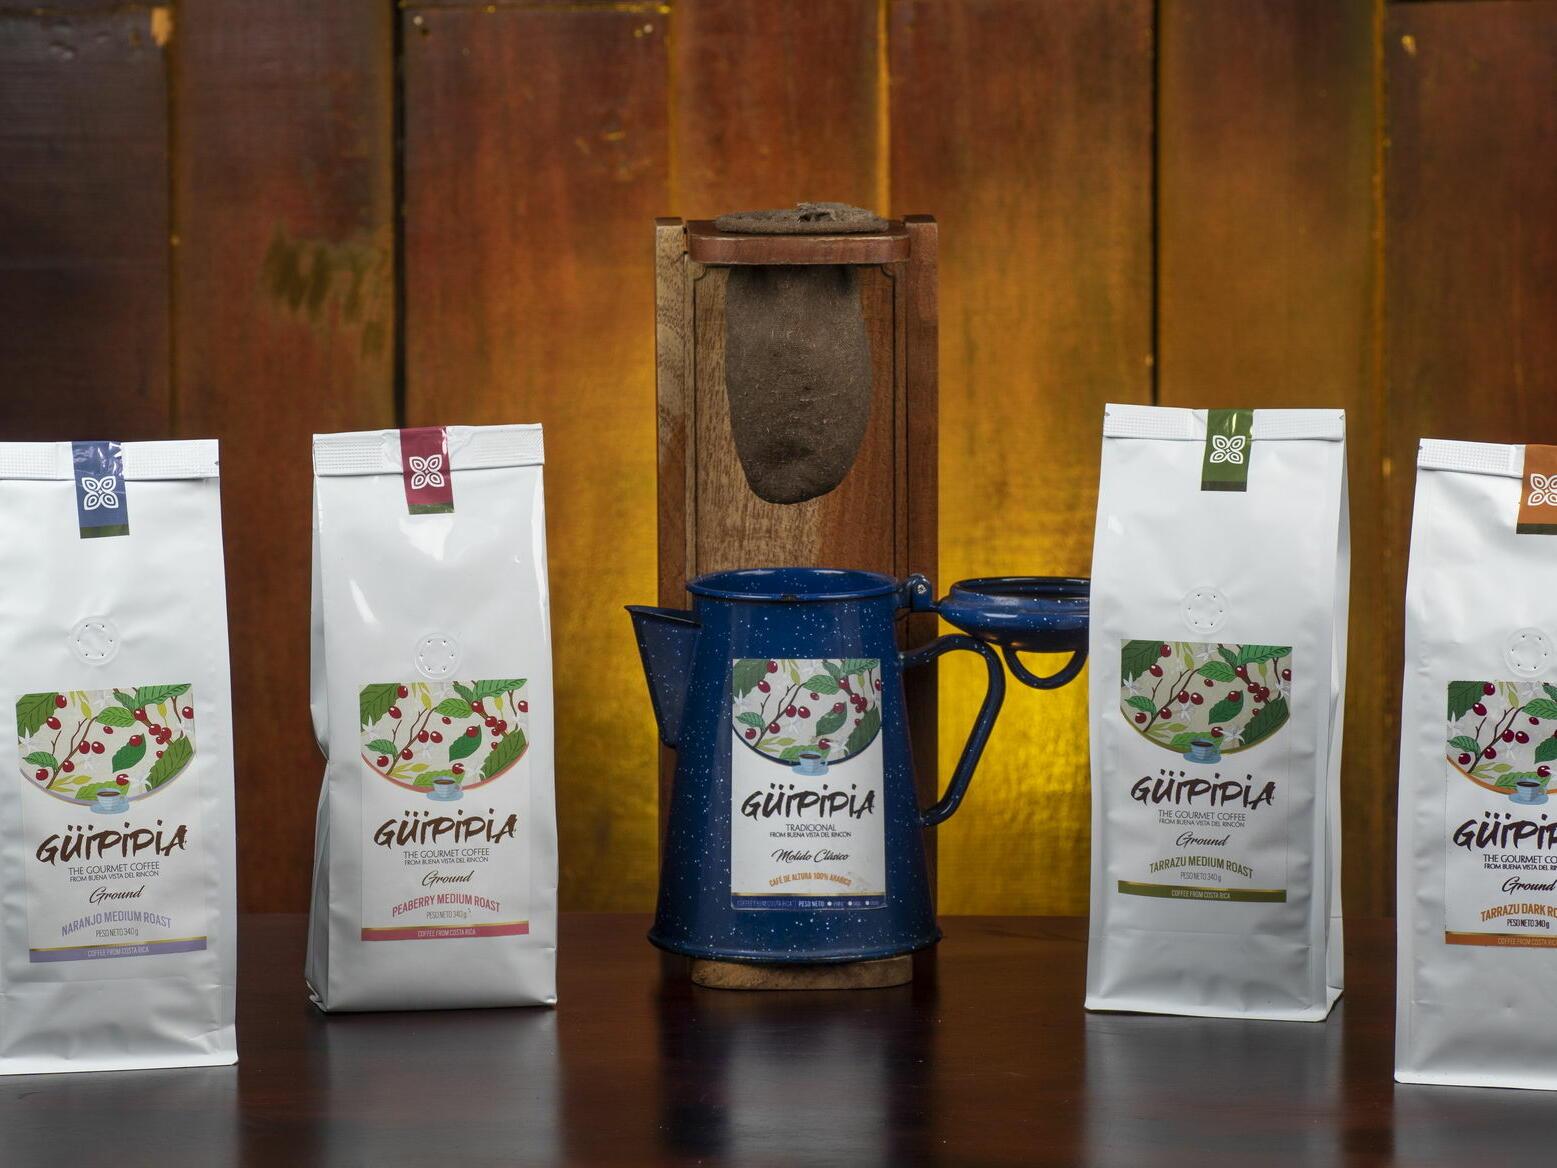 Coffee Maker with Coffee Packs at Buena Vista Del Rincon